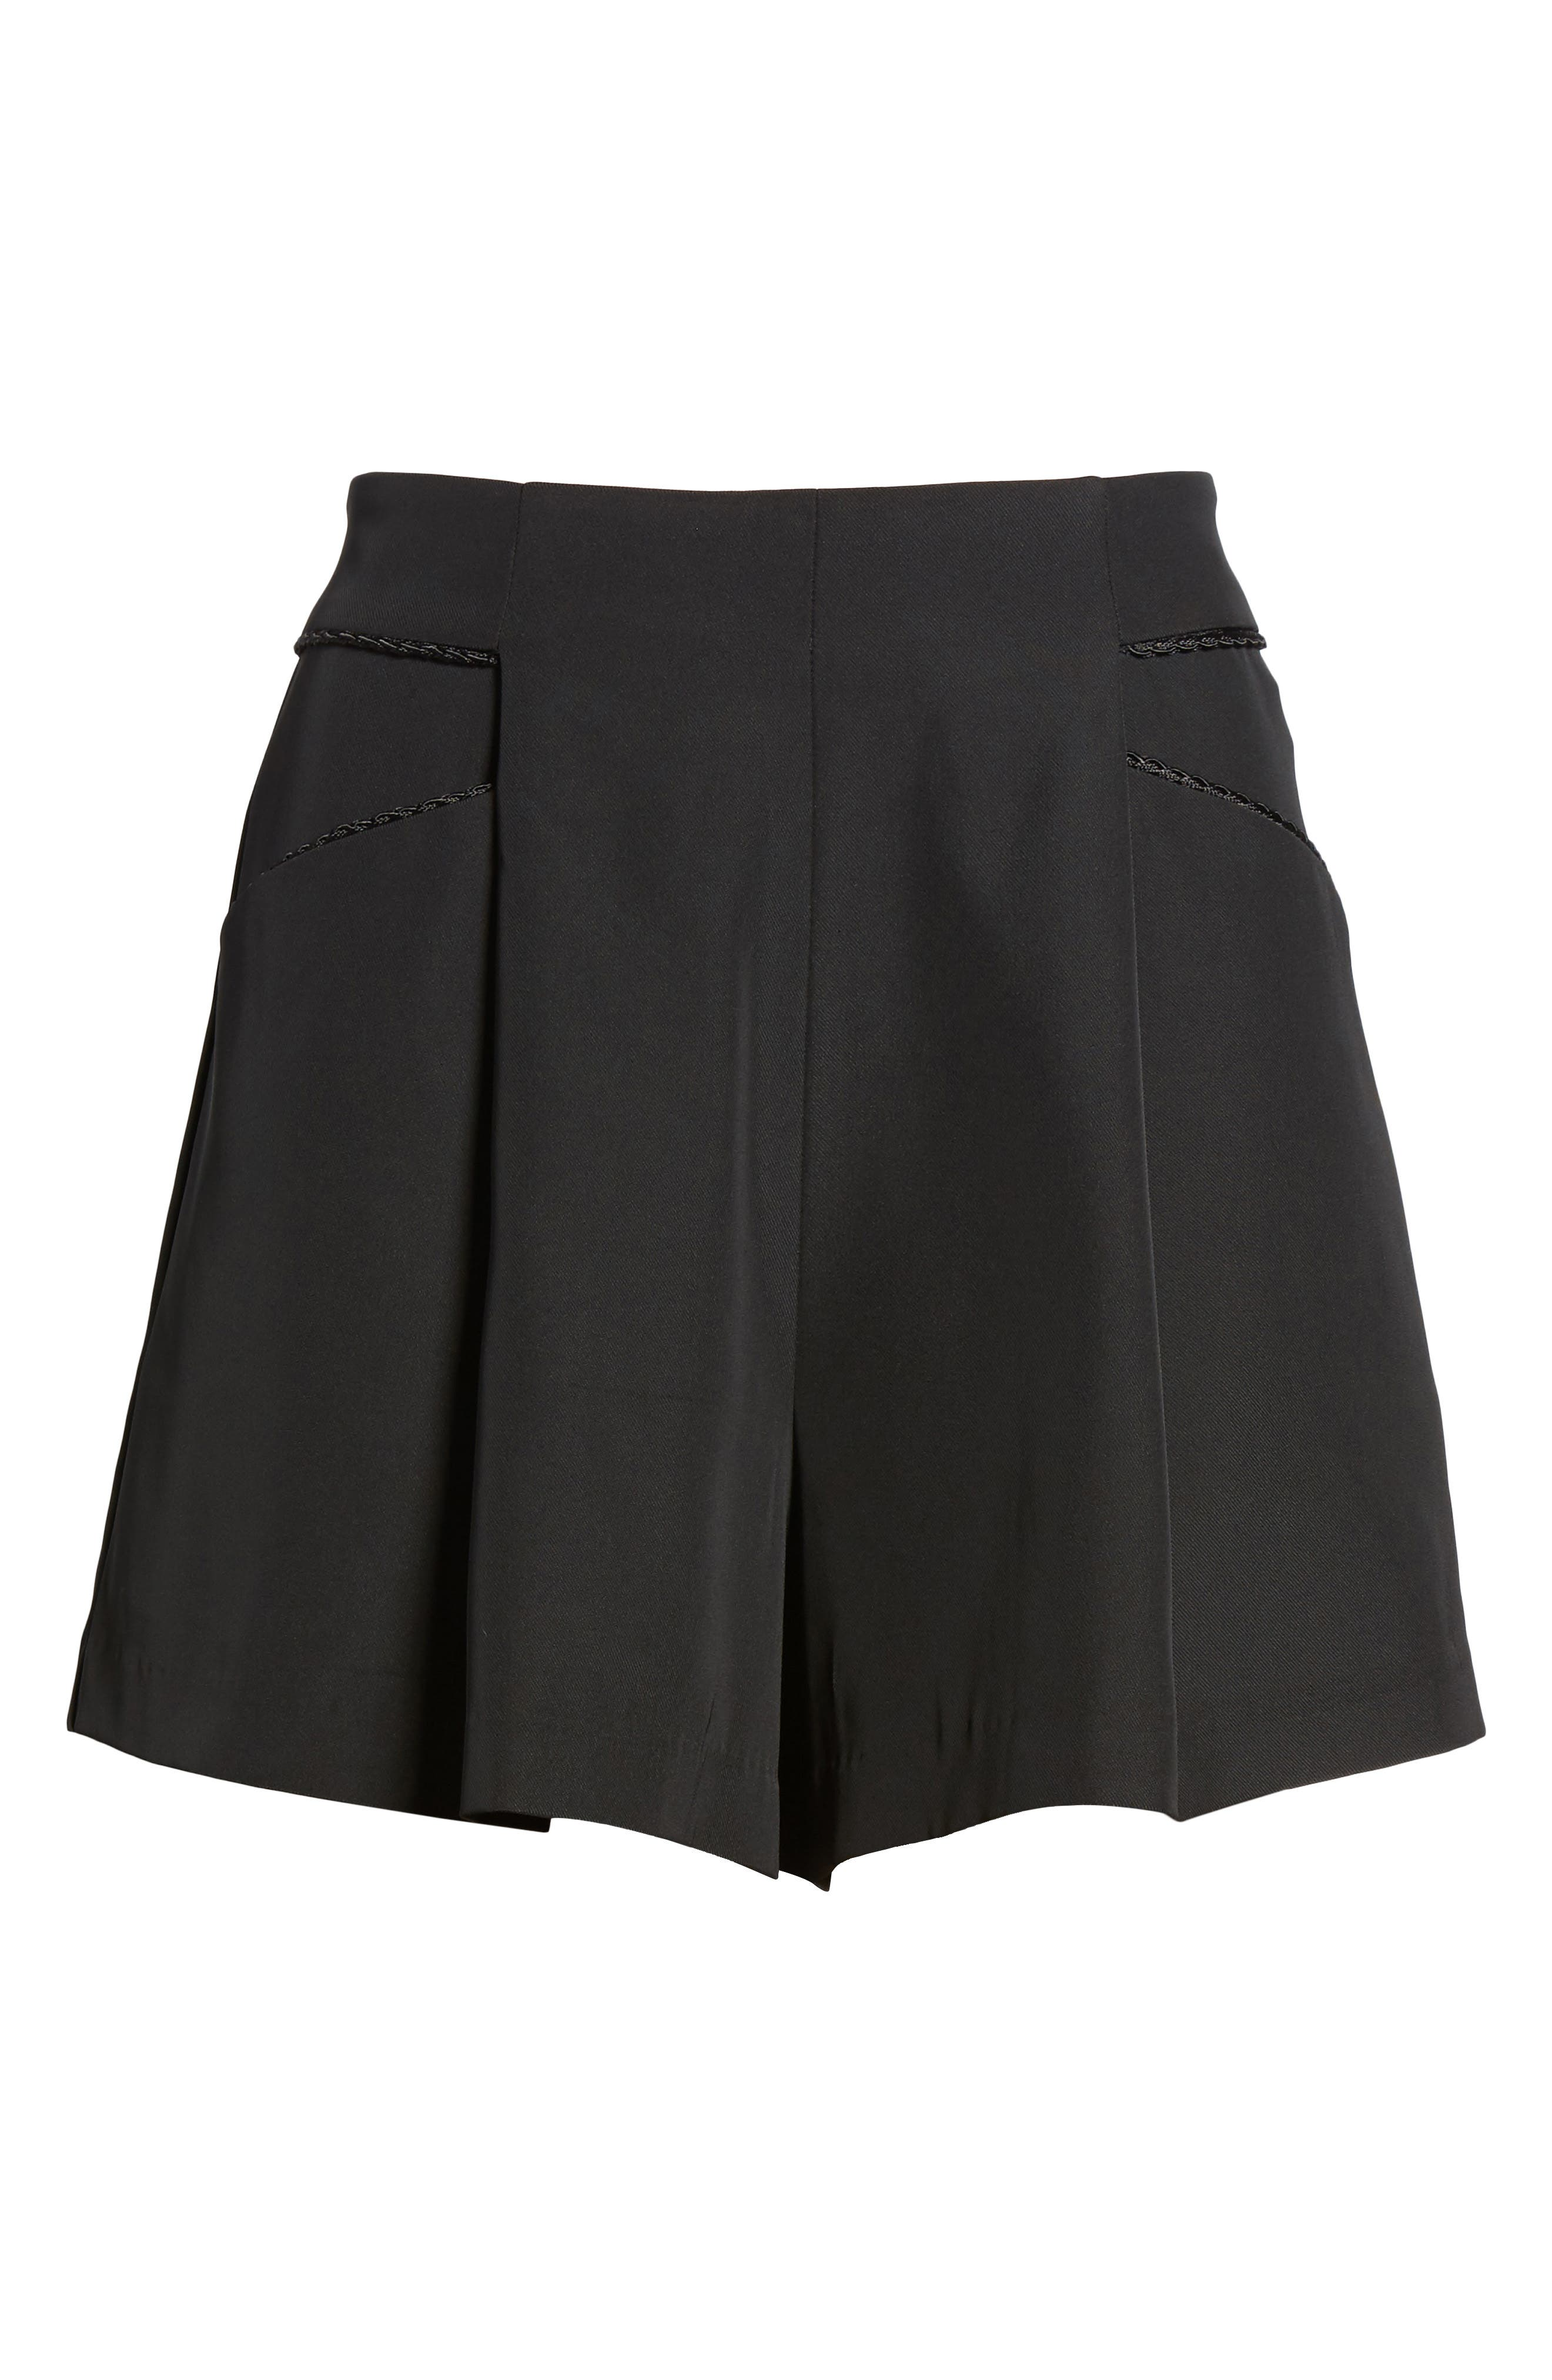 Ceremony High Waist Shorts,                             Alternate thumbnail 6, color,                             001